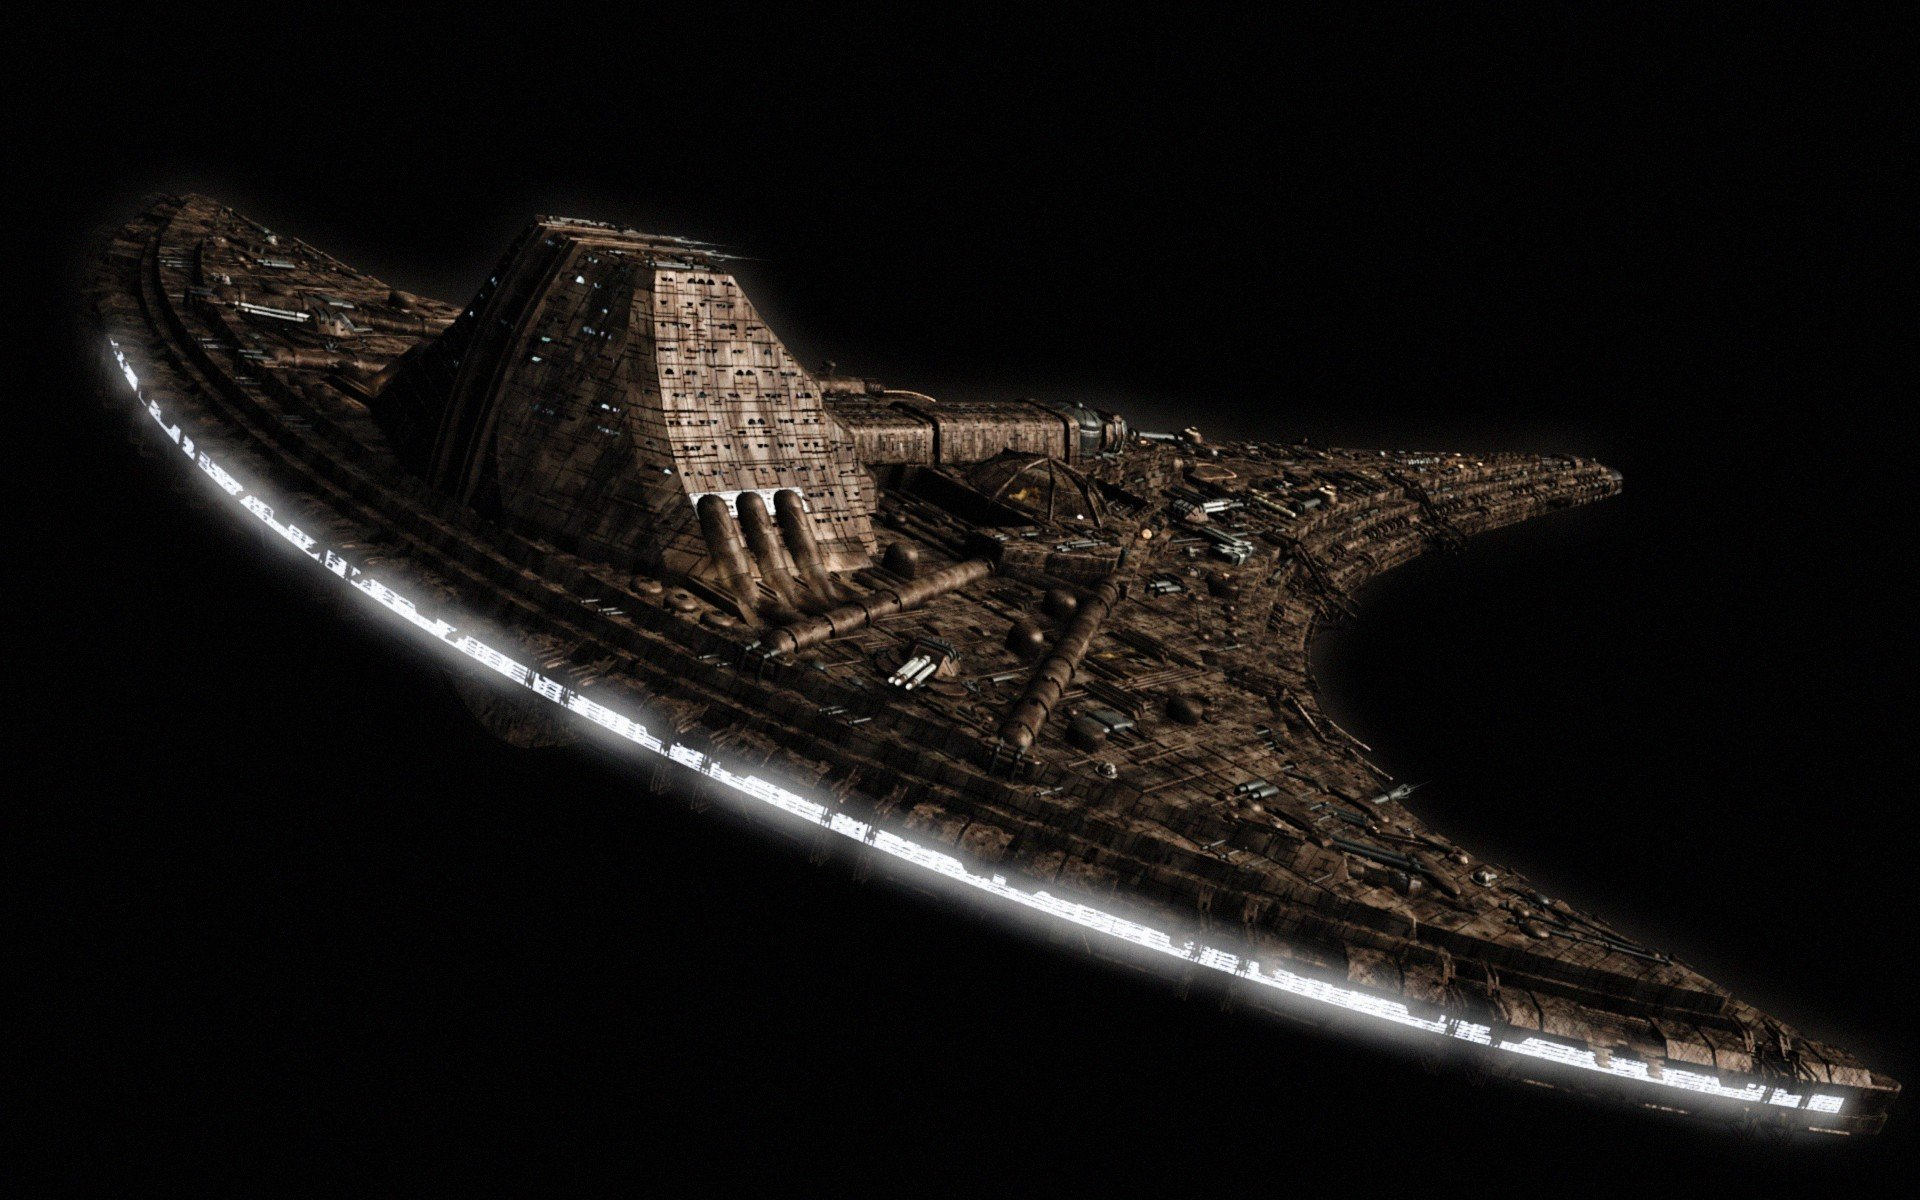 Stargate, Daedalus, Stargate Atlantis